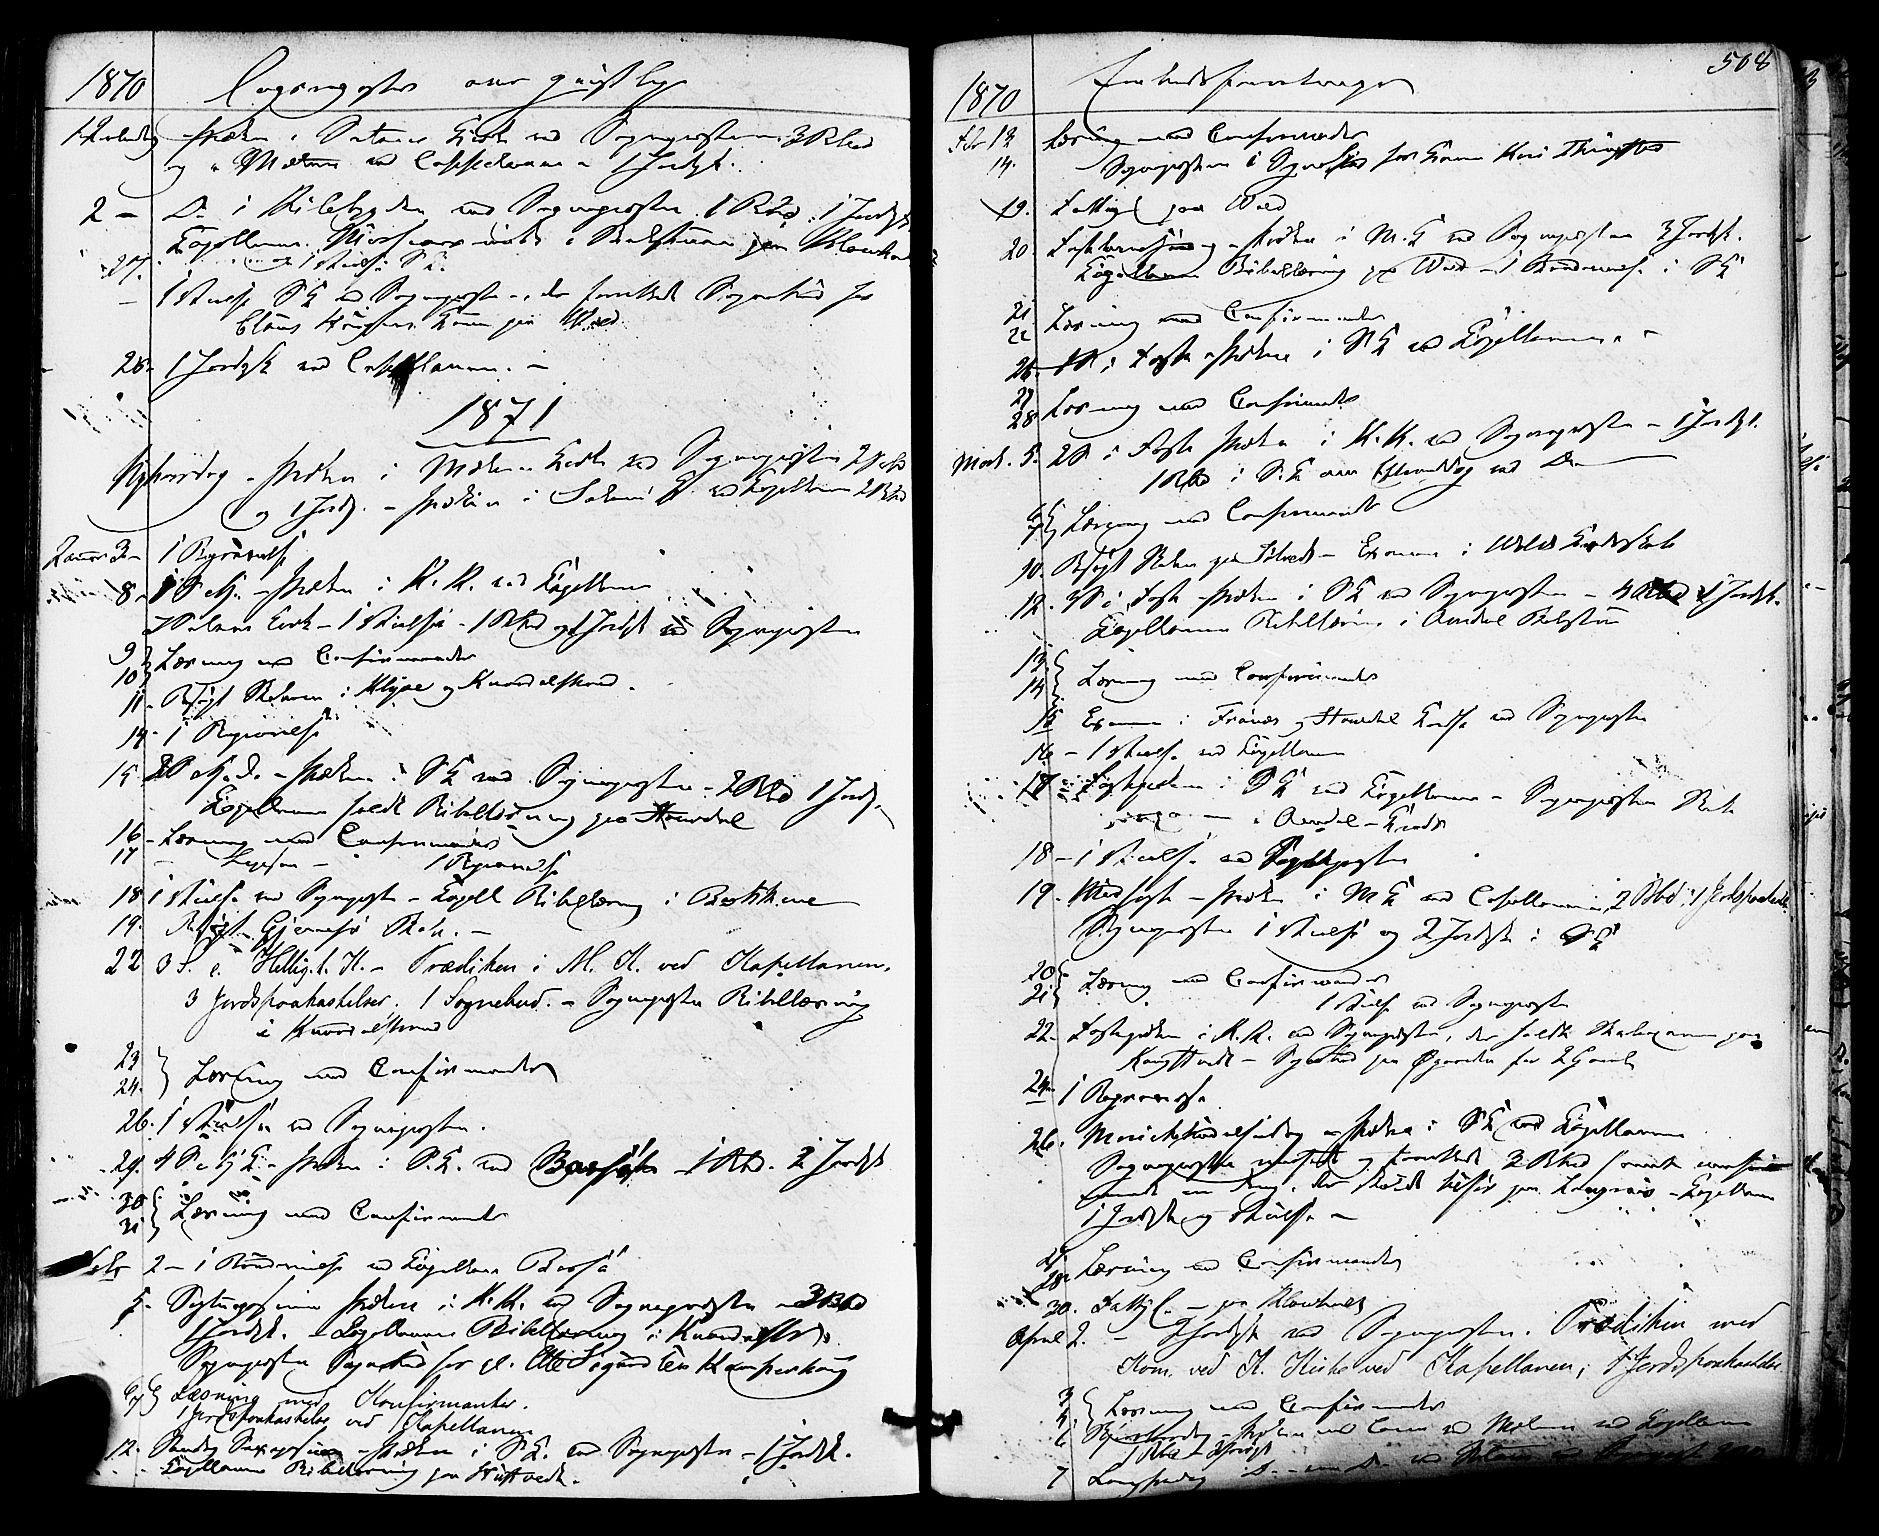 SAKO, Solum kirkebøker, F/Fa/L0008: Ministerialbok nr. I 8, 1865-1876, s. 508